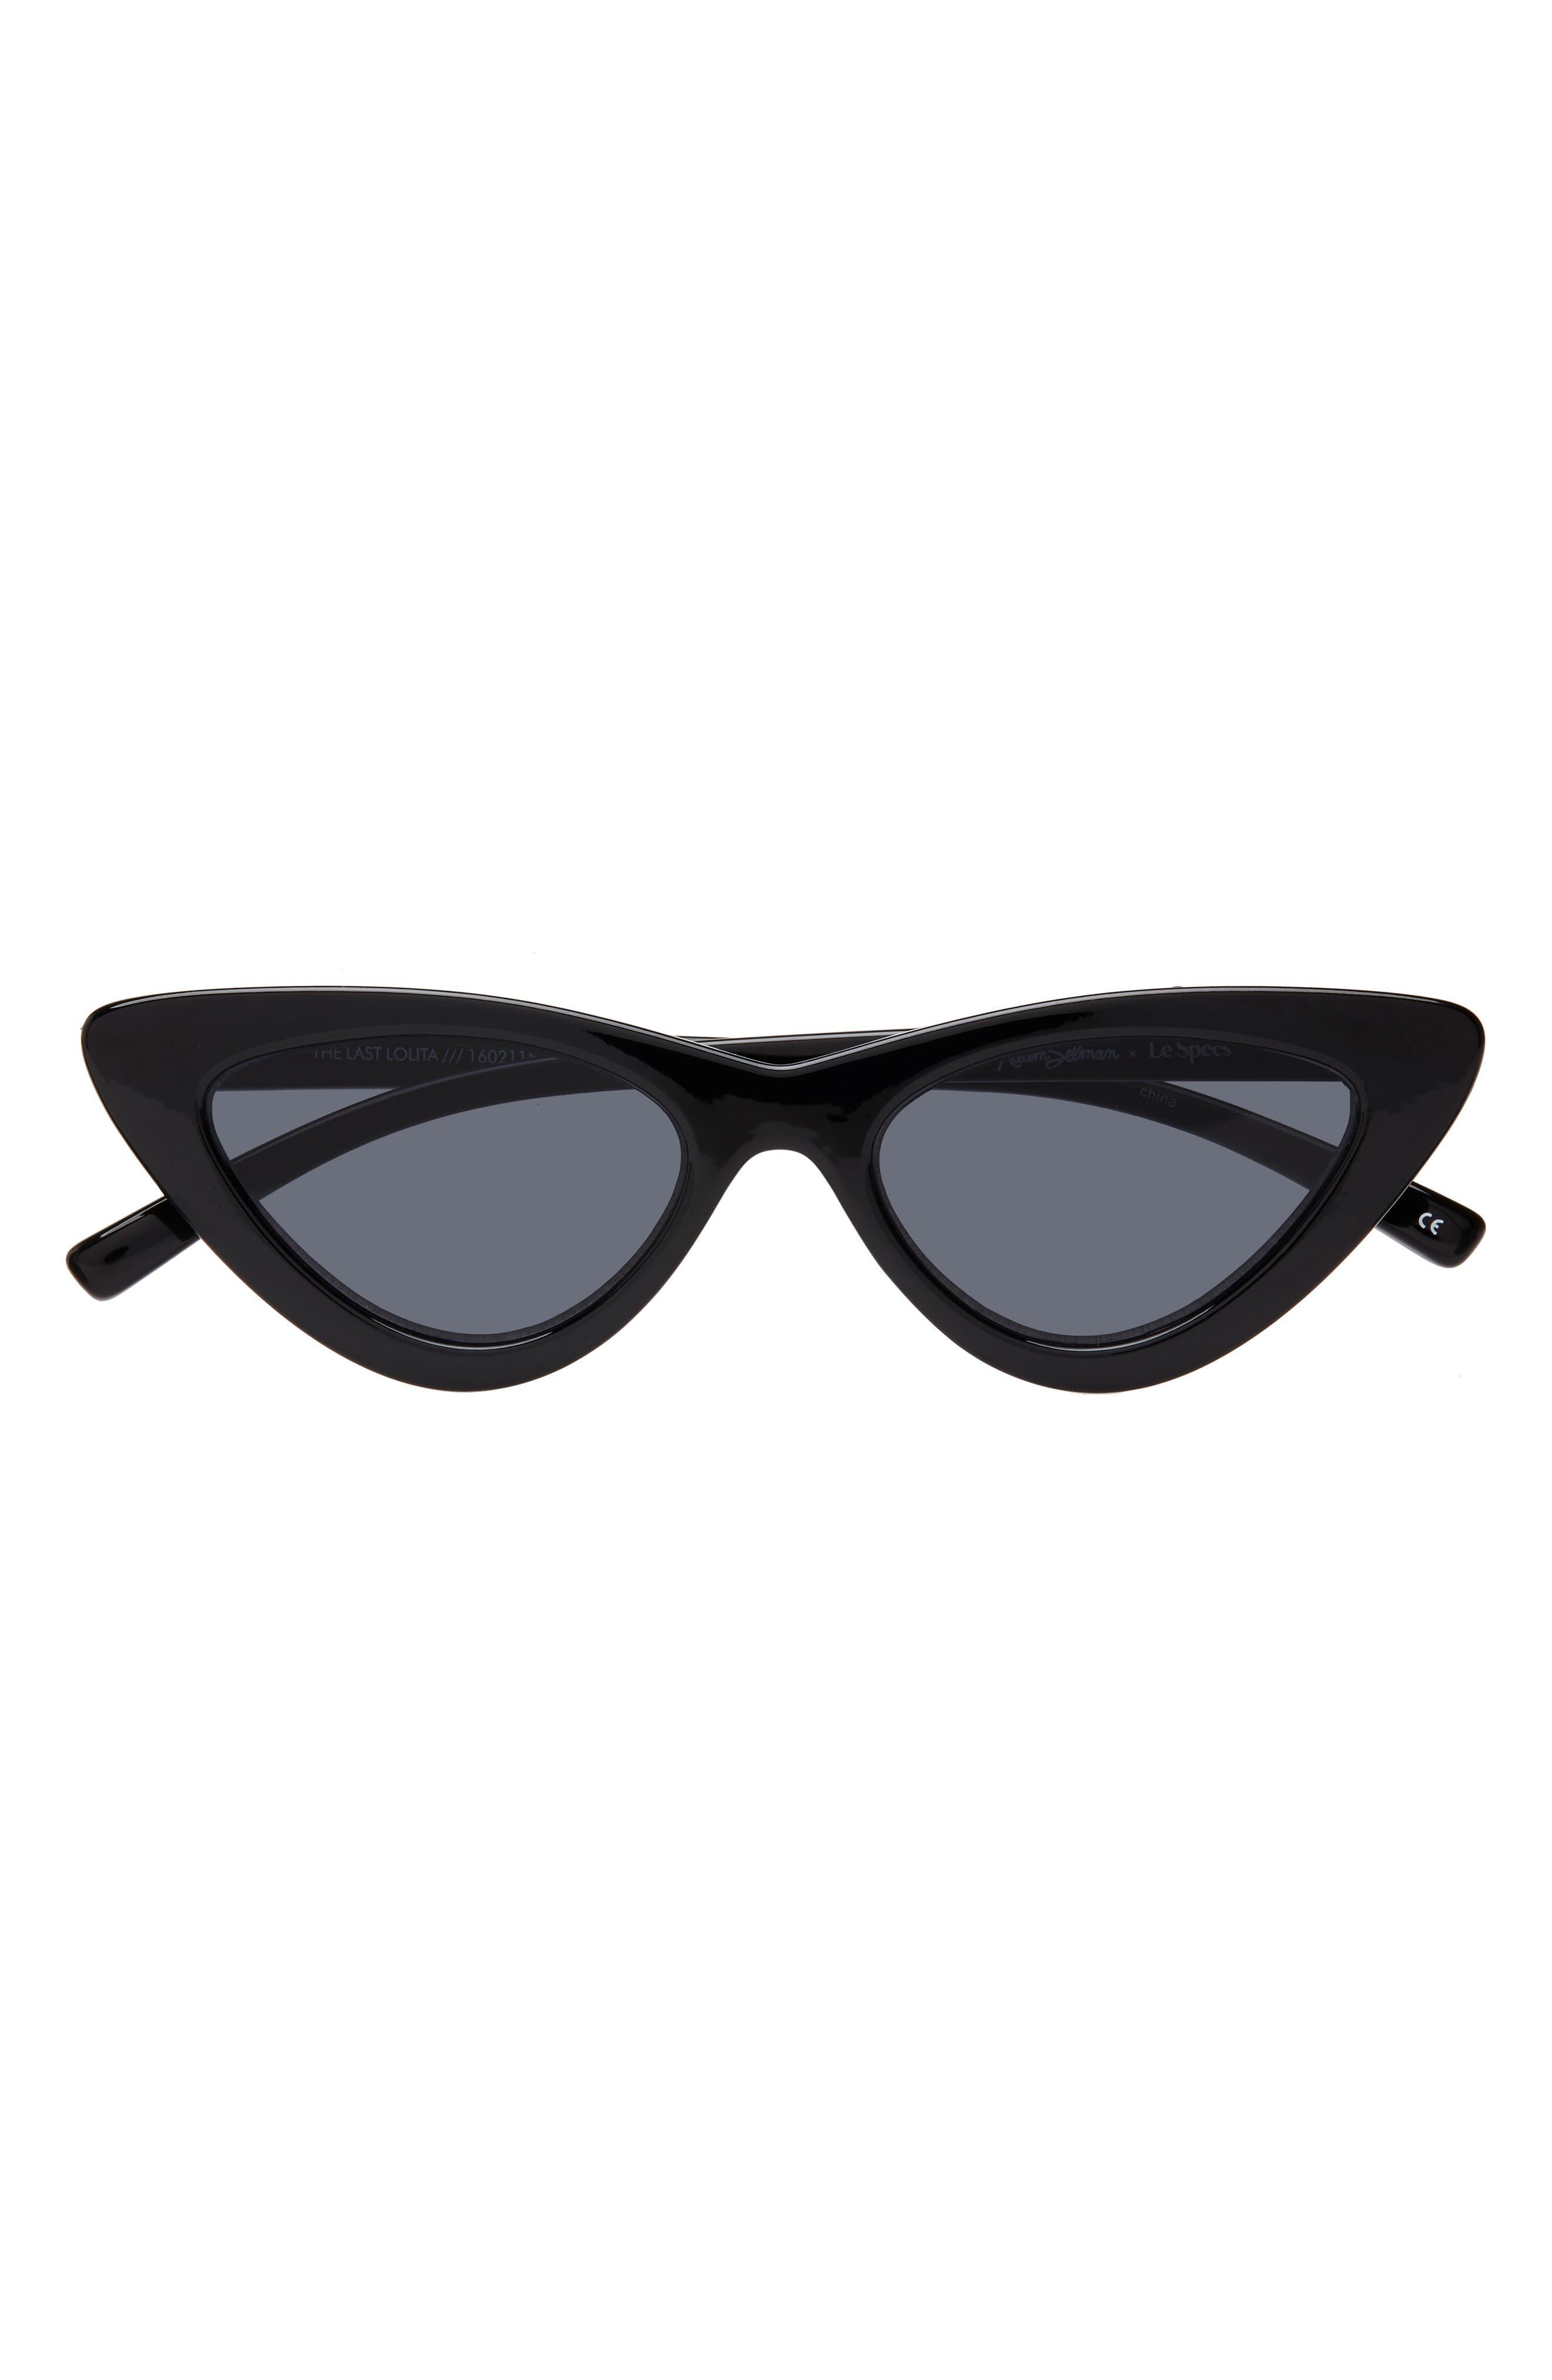 Adam Selman X Le Specs Luxe Lolita 4m Cat Eye Sunglasses - Black